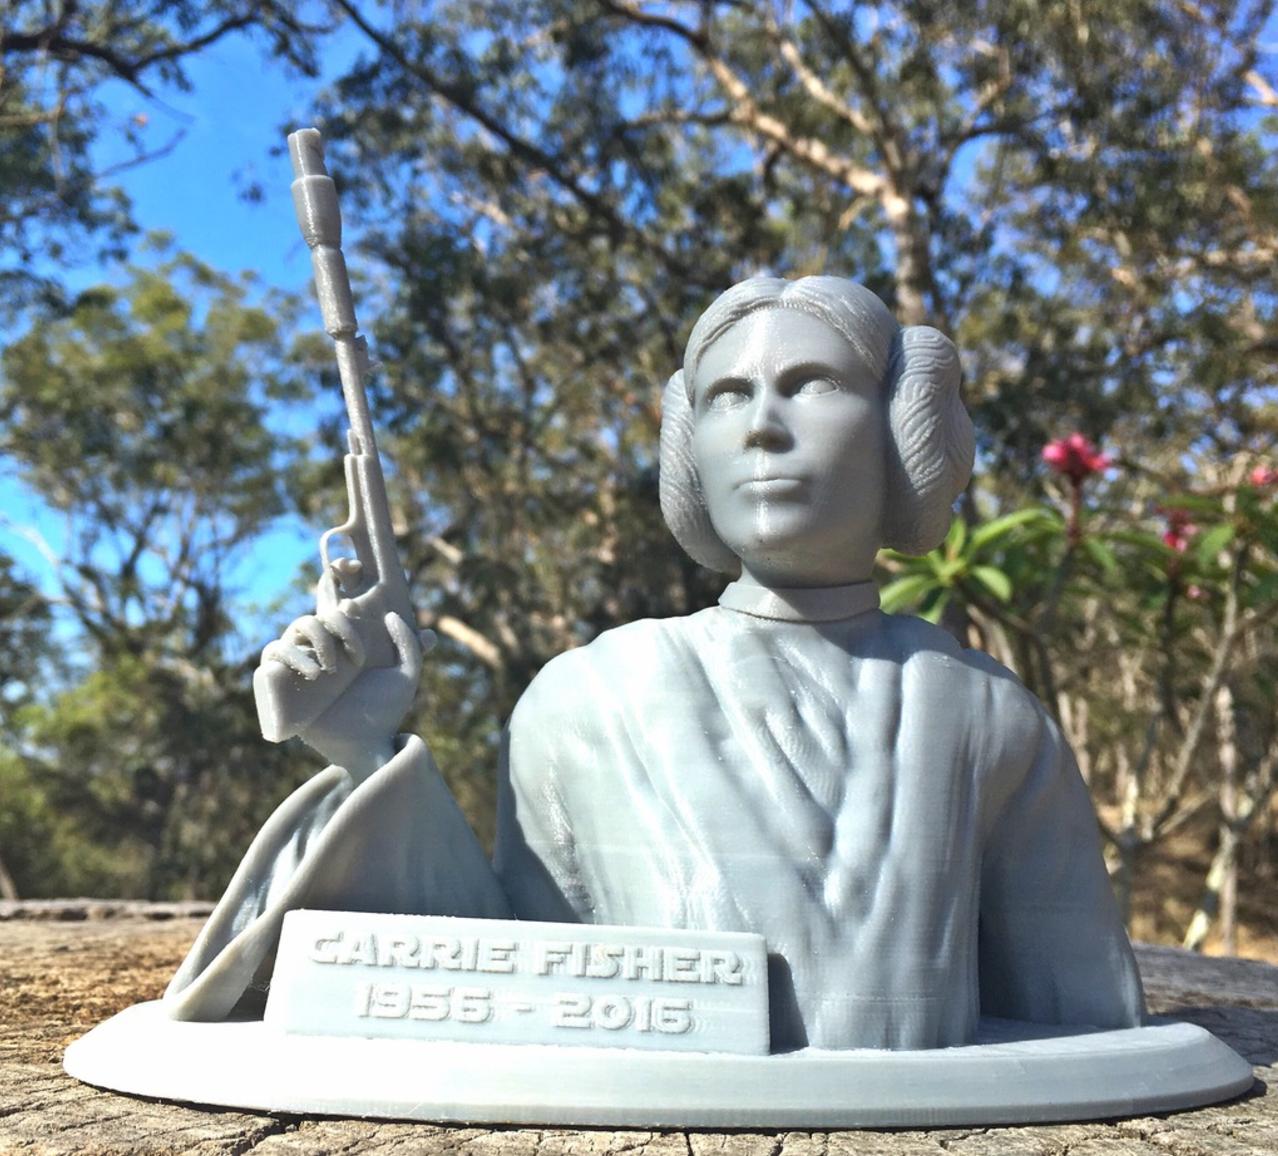 Capture d'écran 2016-12-30 à 15.53.18.png Download free STL file Carrie Fisher Memorial Bust - 1956-2016 • 3D printing design, Geoffro